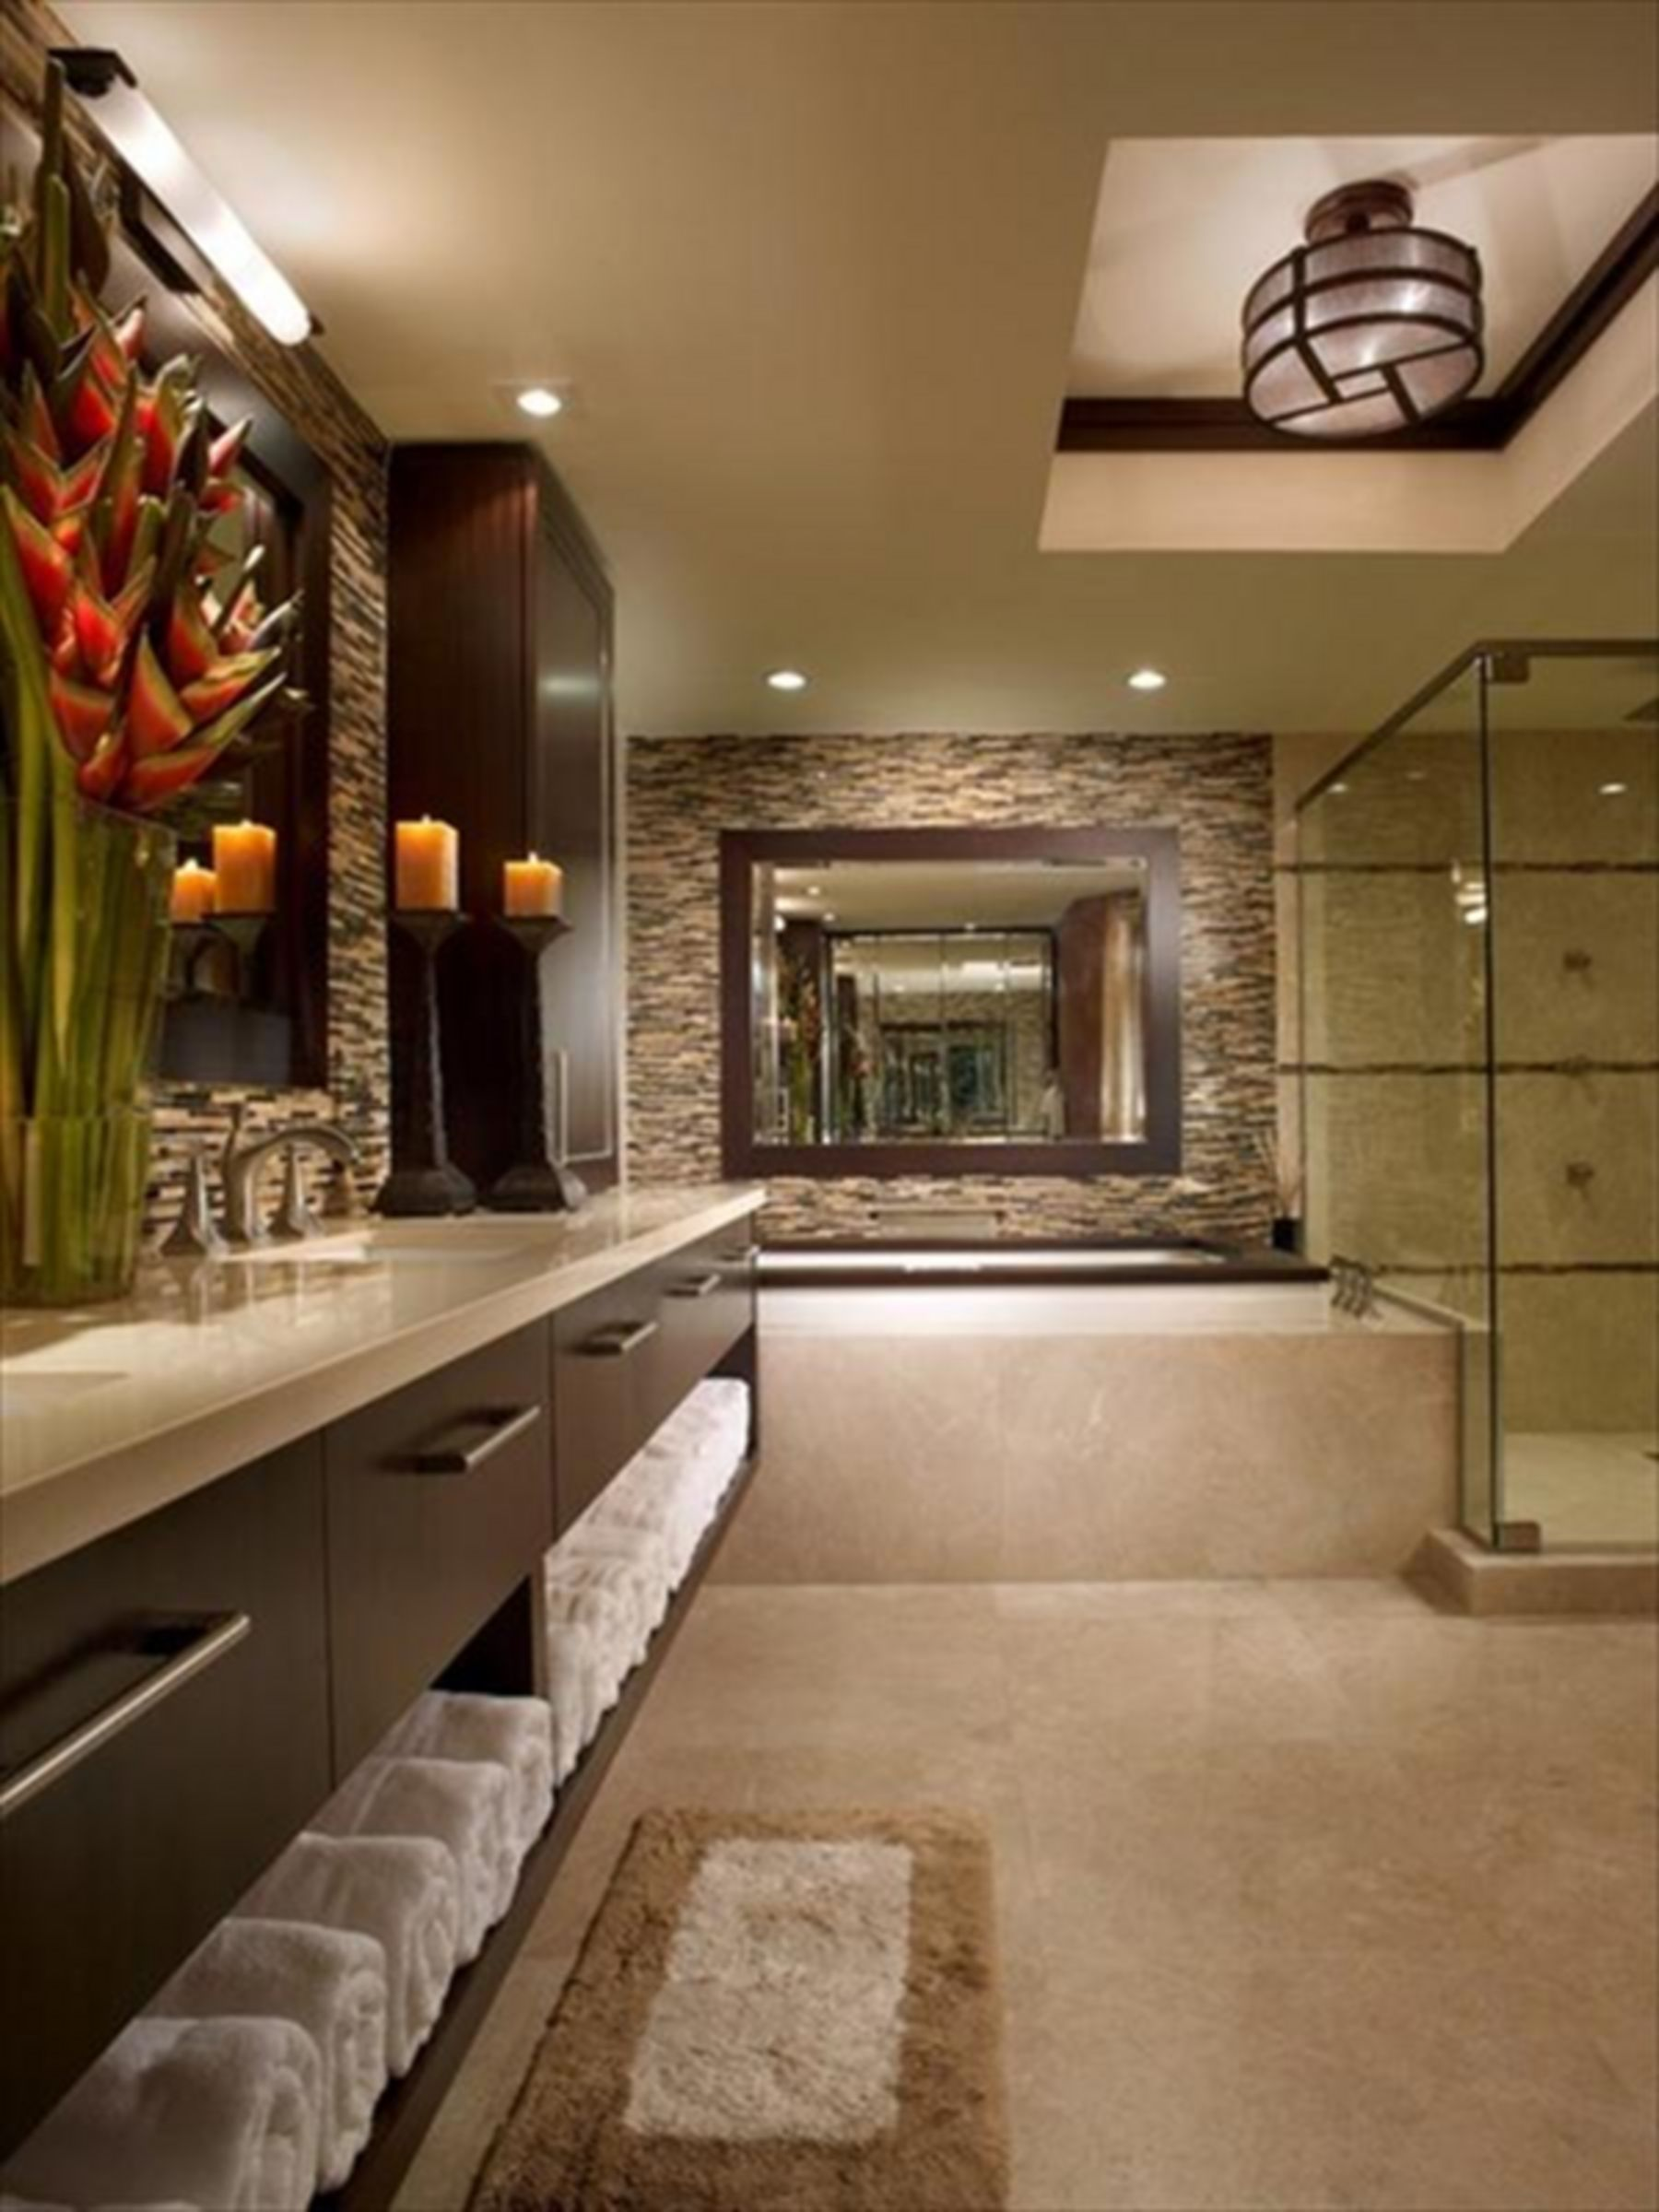 8 Luxury Bathroom Design Ideas On A Budget Modern Luxury Bathroom Luxury Master Bathrooms Bathroom Design Luxury